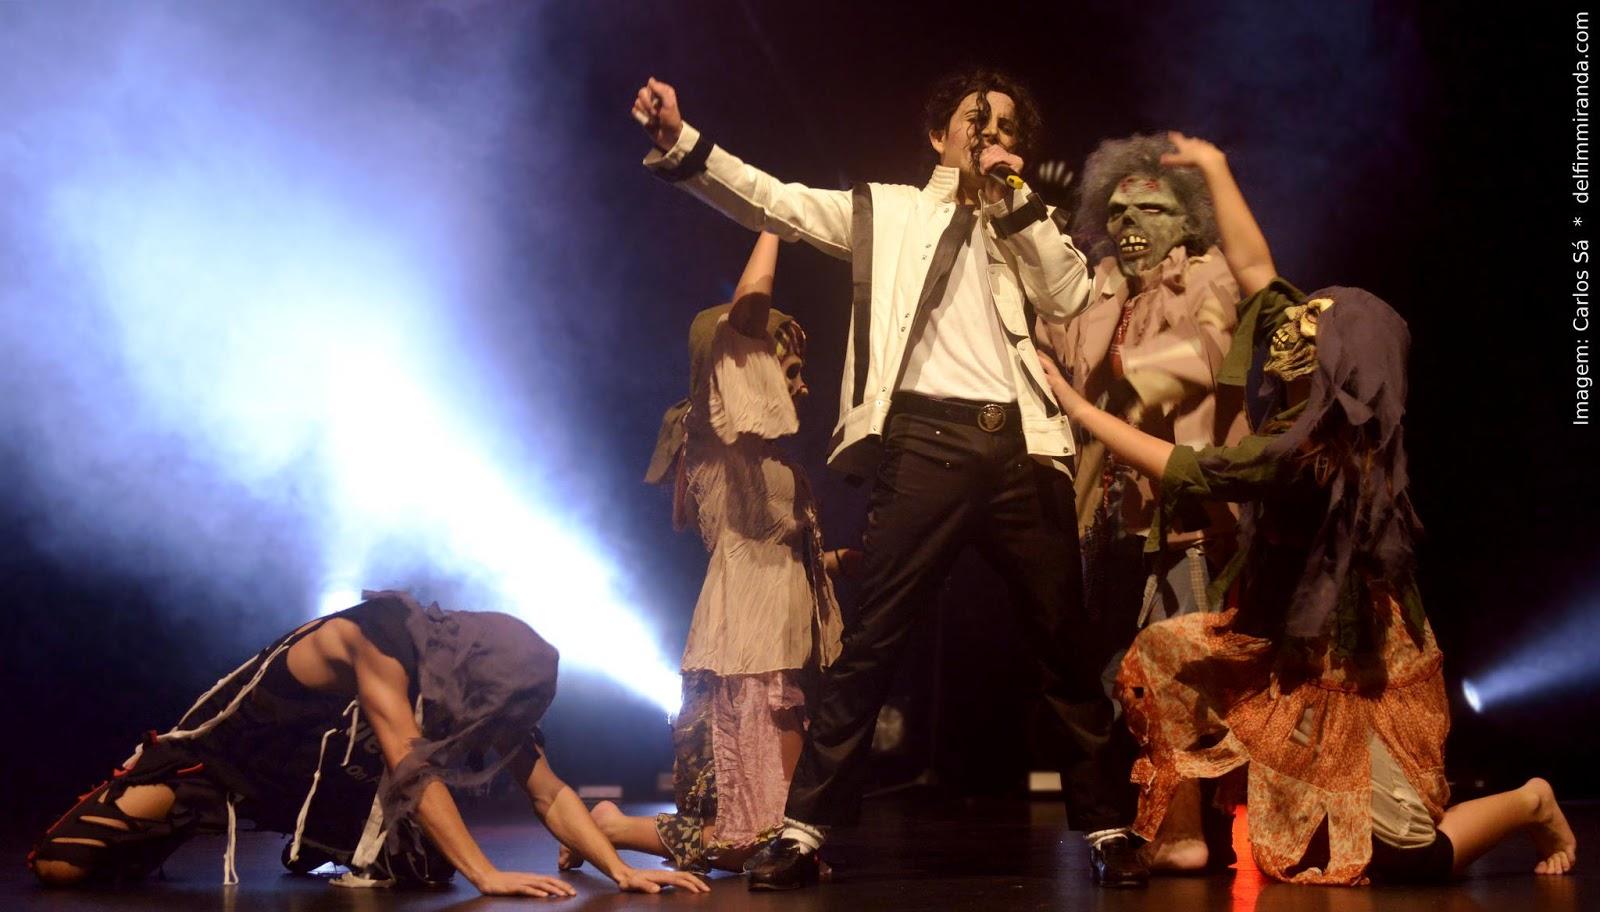 Delfim Miranda - Michael Jackson Tribute - Thriller - Live on Stage - White jacket